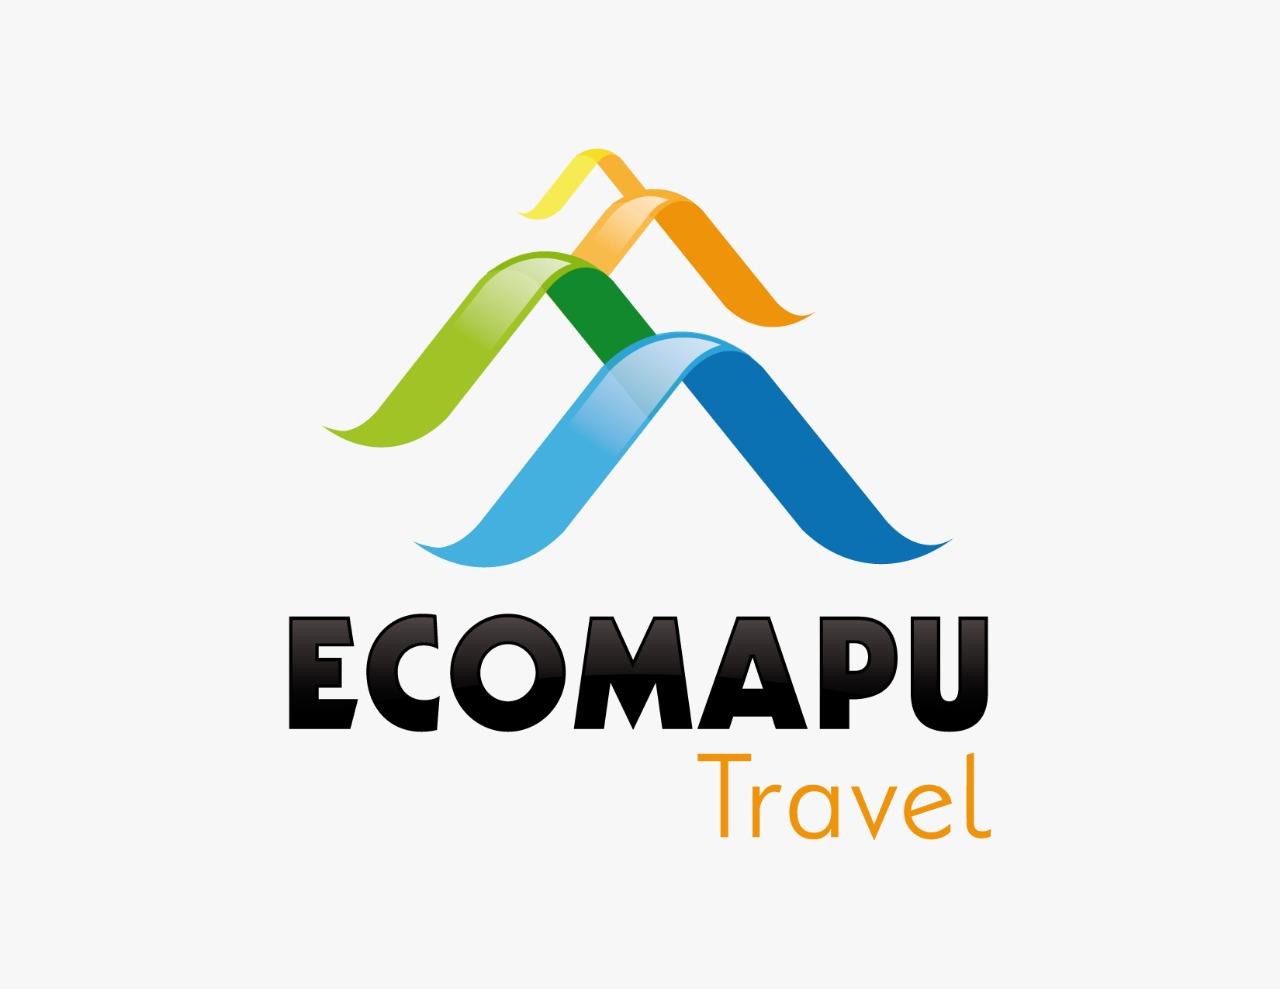 Ecomapu